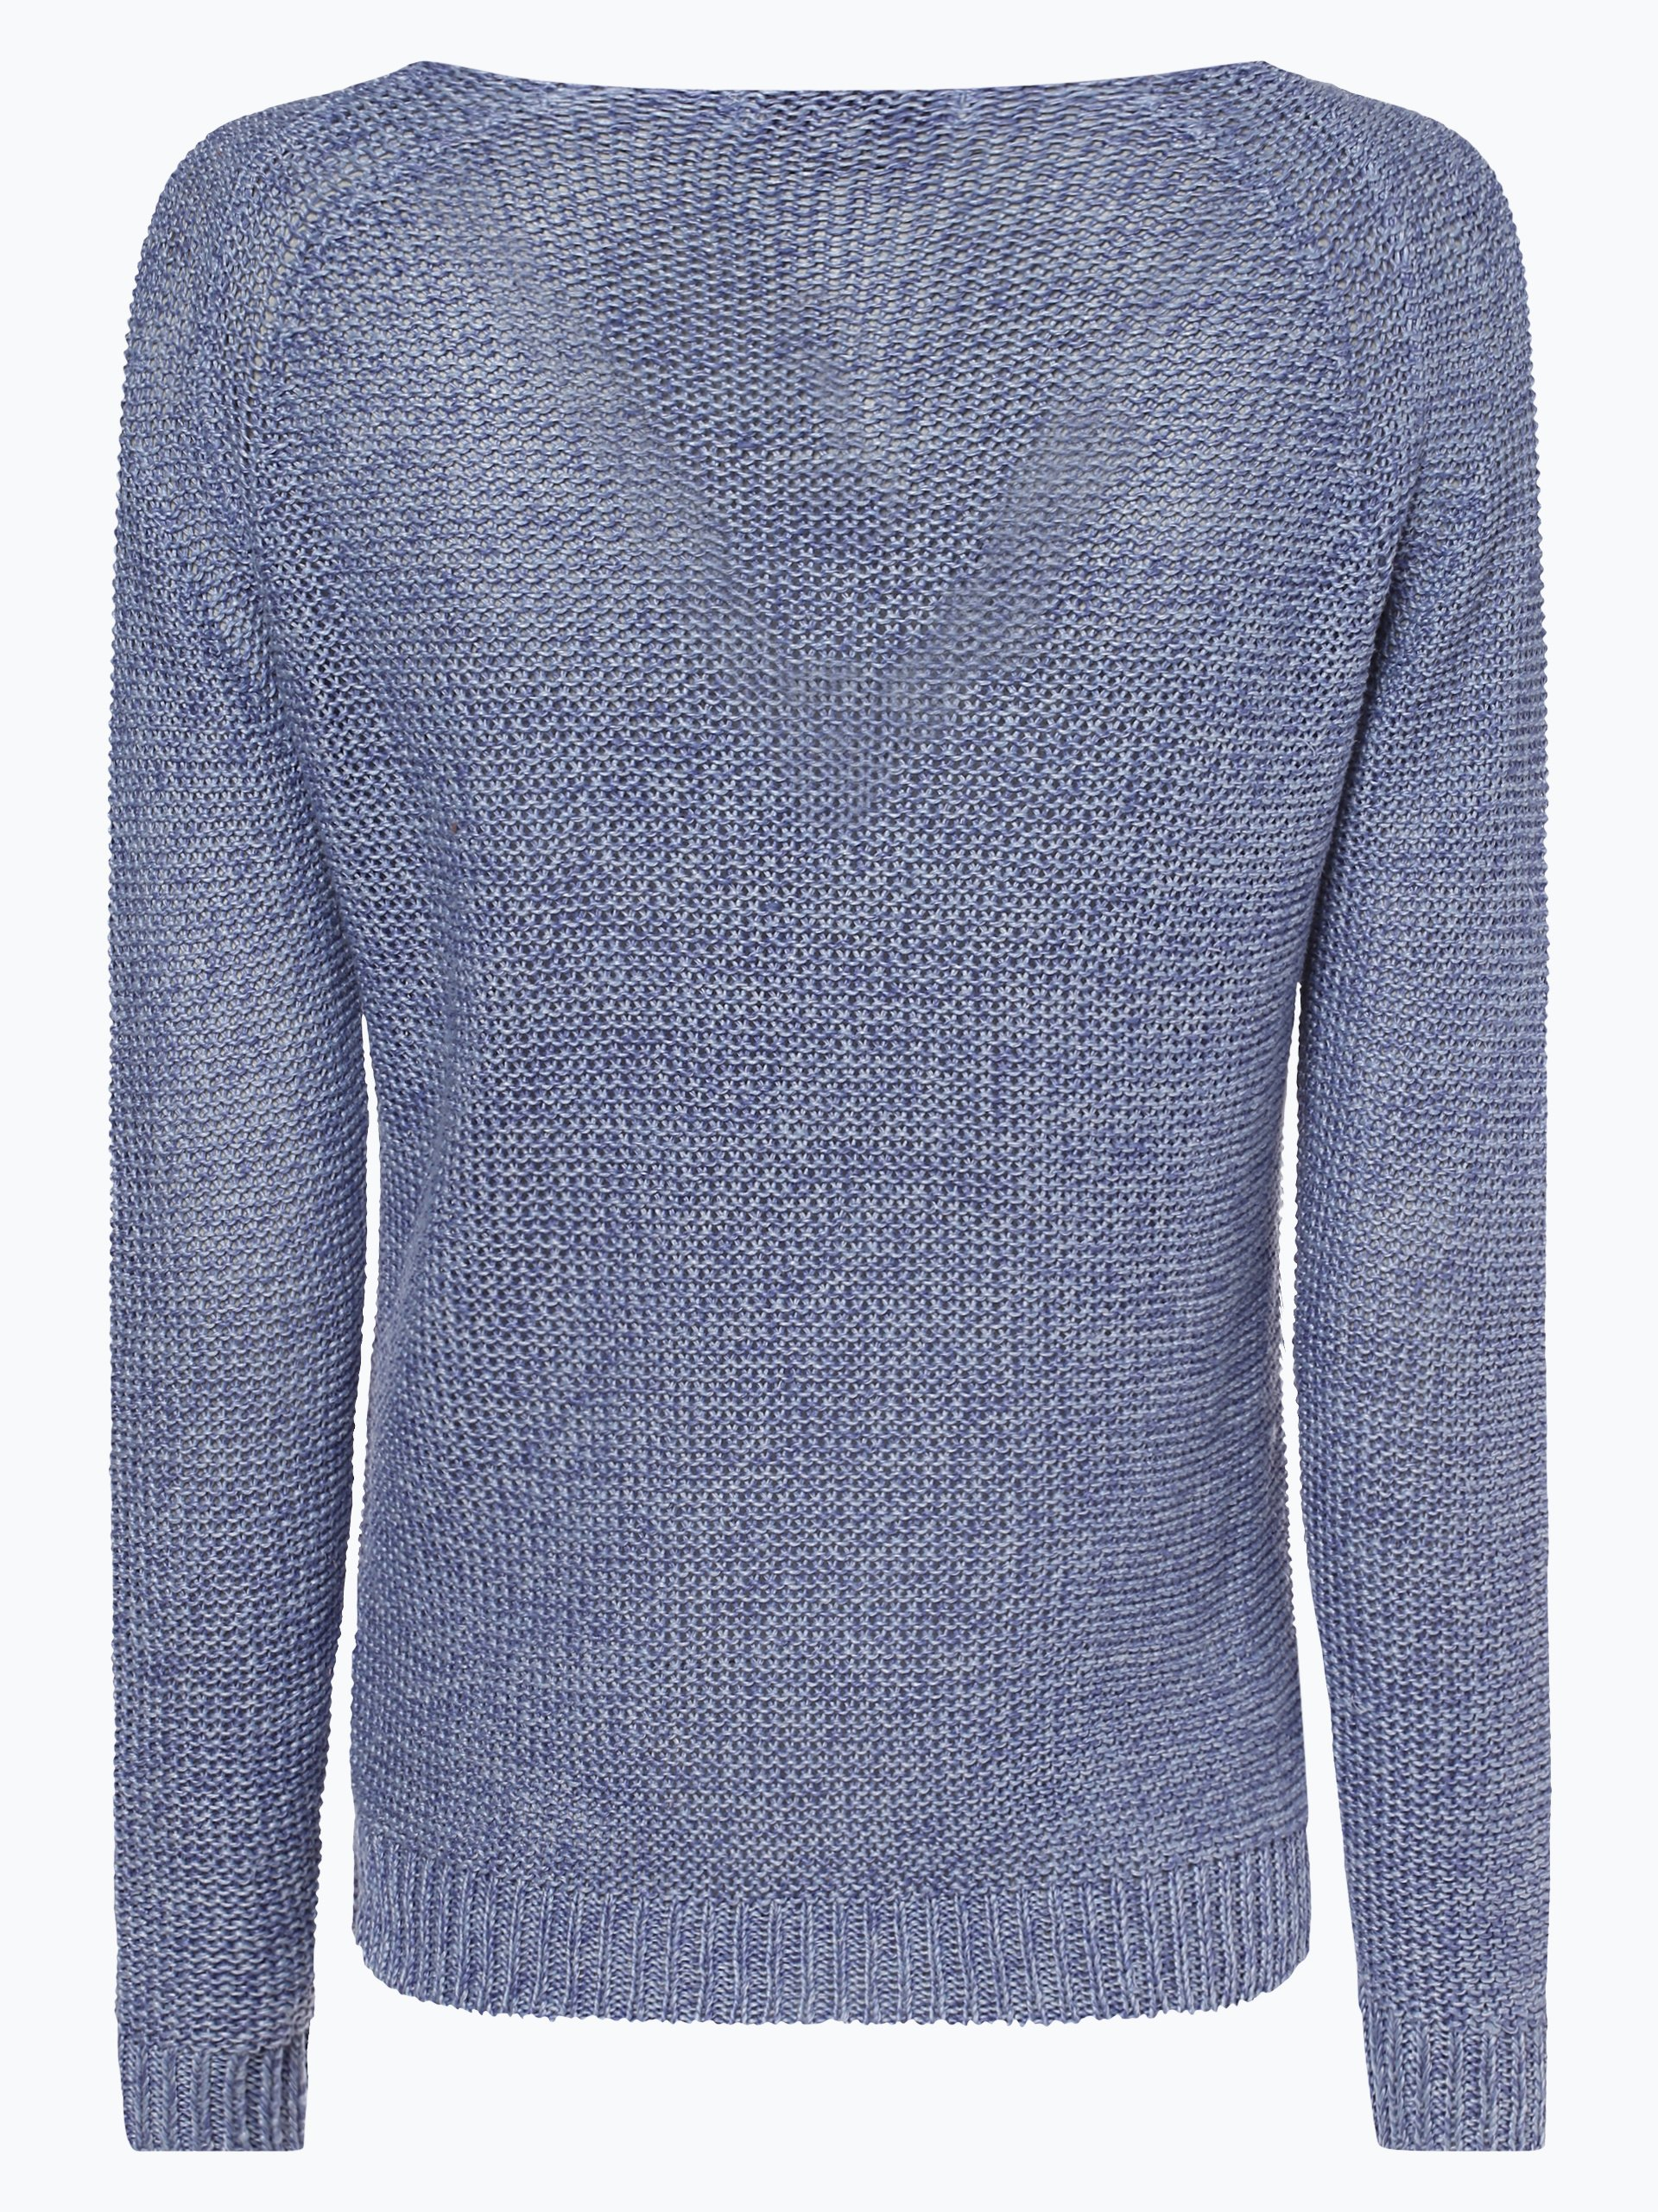 Apriori Damen Pullover aus Leinen